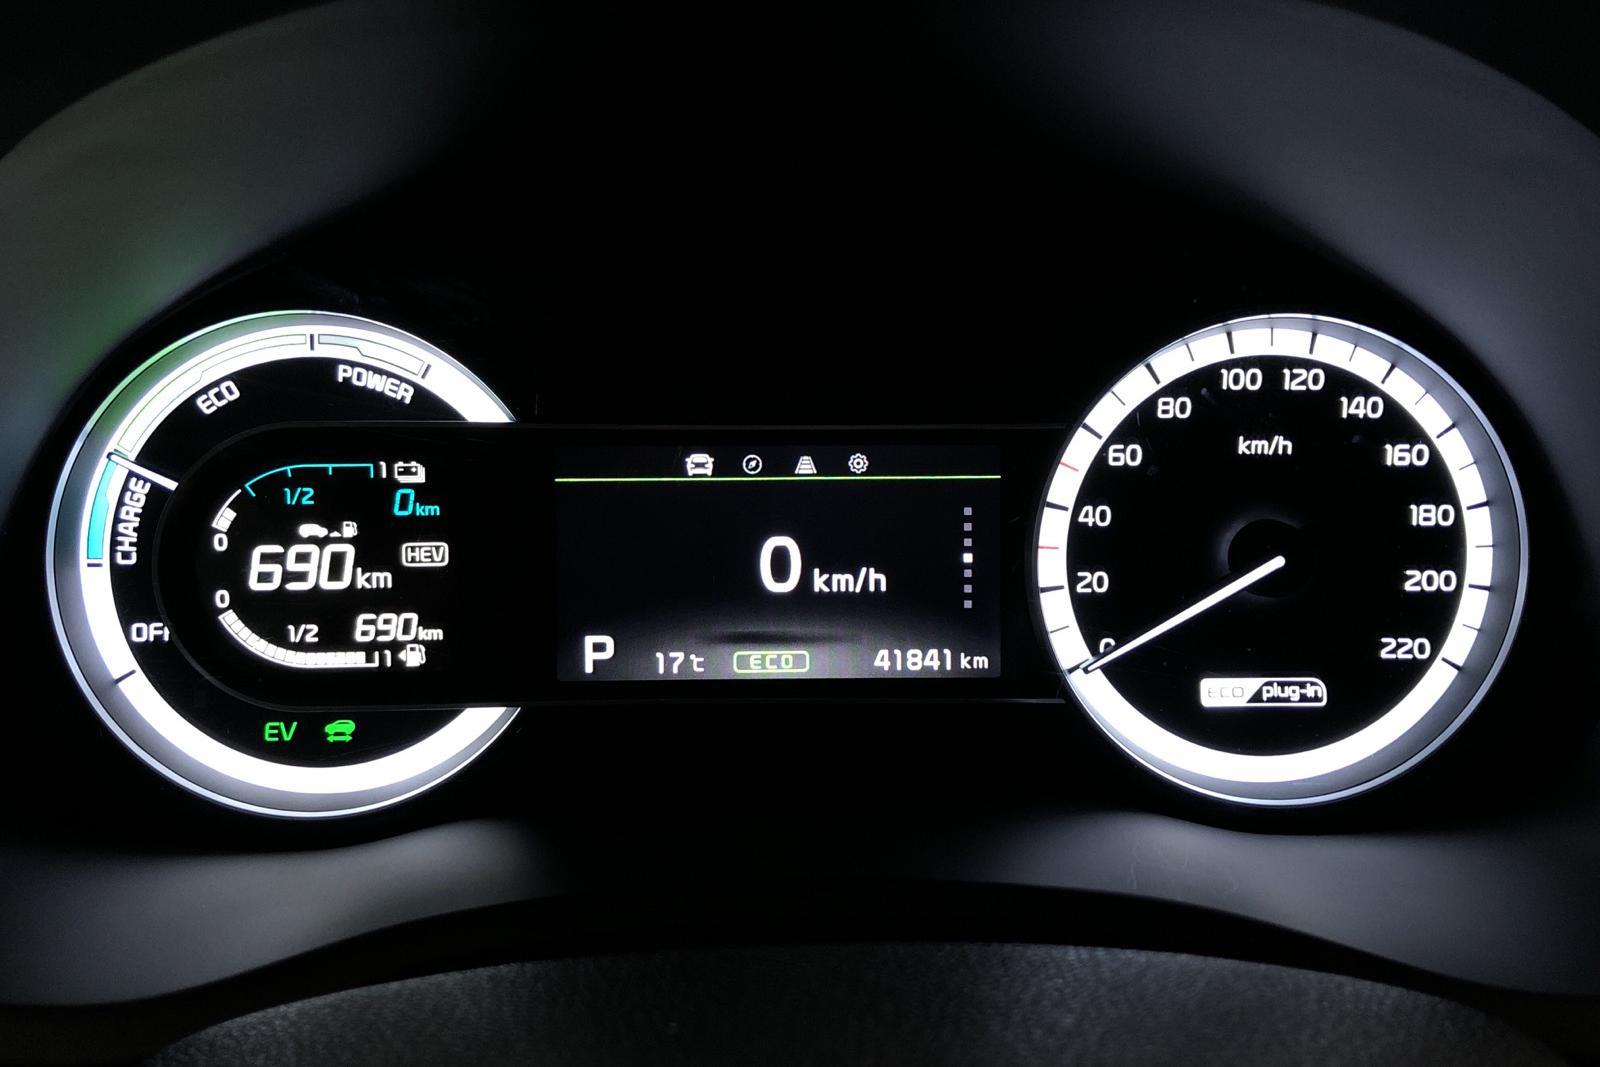 KIA Niro Plug-in Hybrid 1.6 Plus 2 (141hk) - 0 km - Automatic - white - 2019